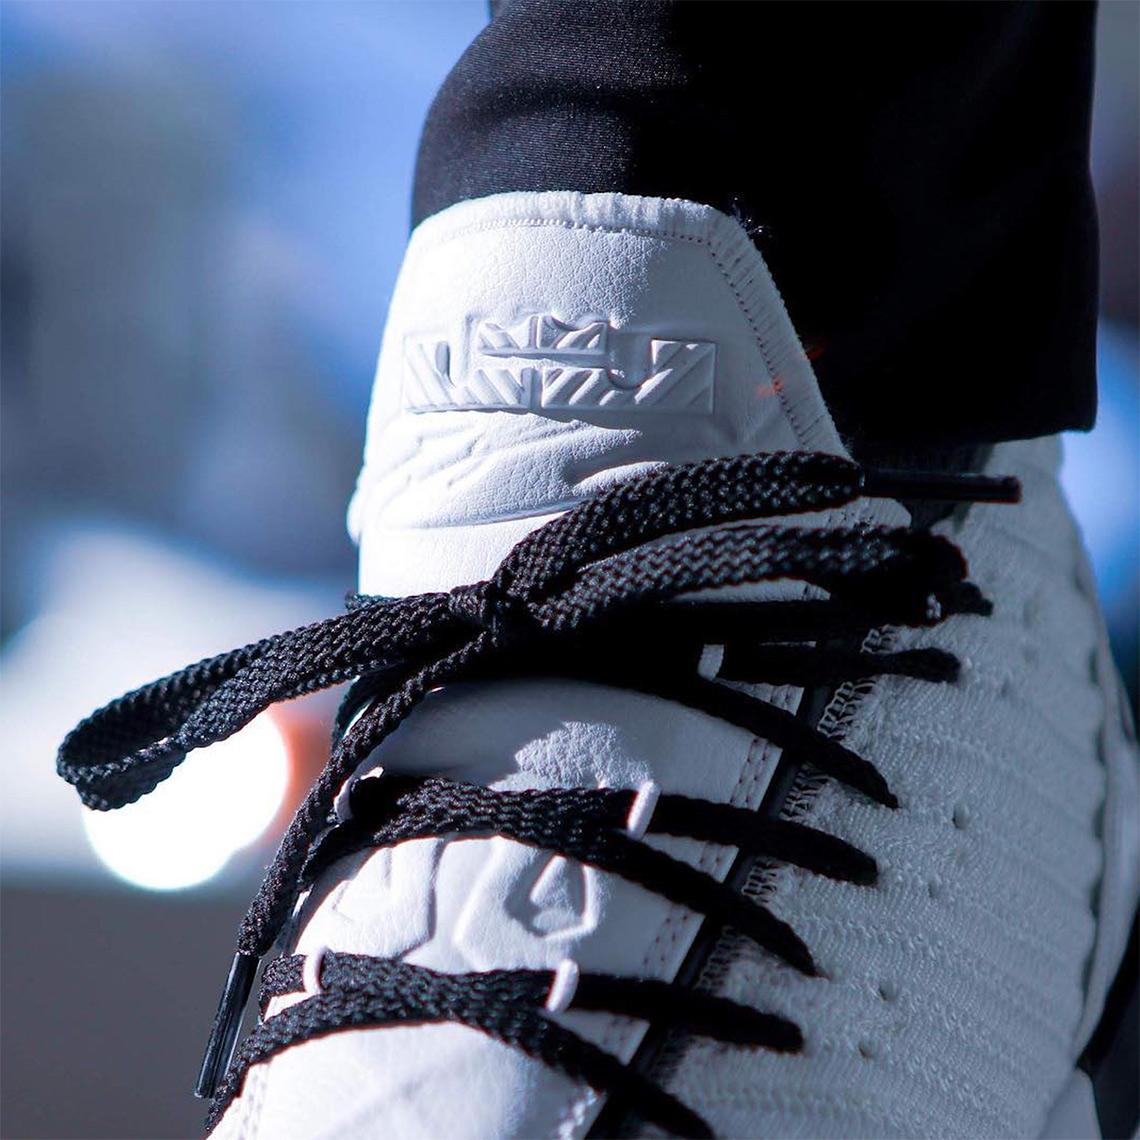 559268c5cf5 Nike LeBron 16 Equality Pack BQ5969-100 + BQ5969-101